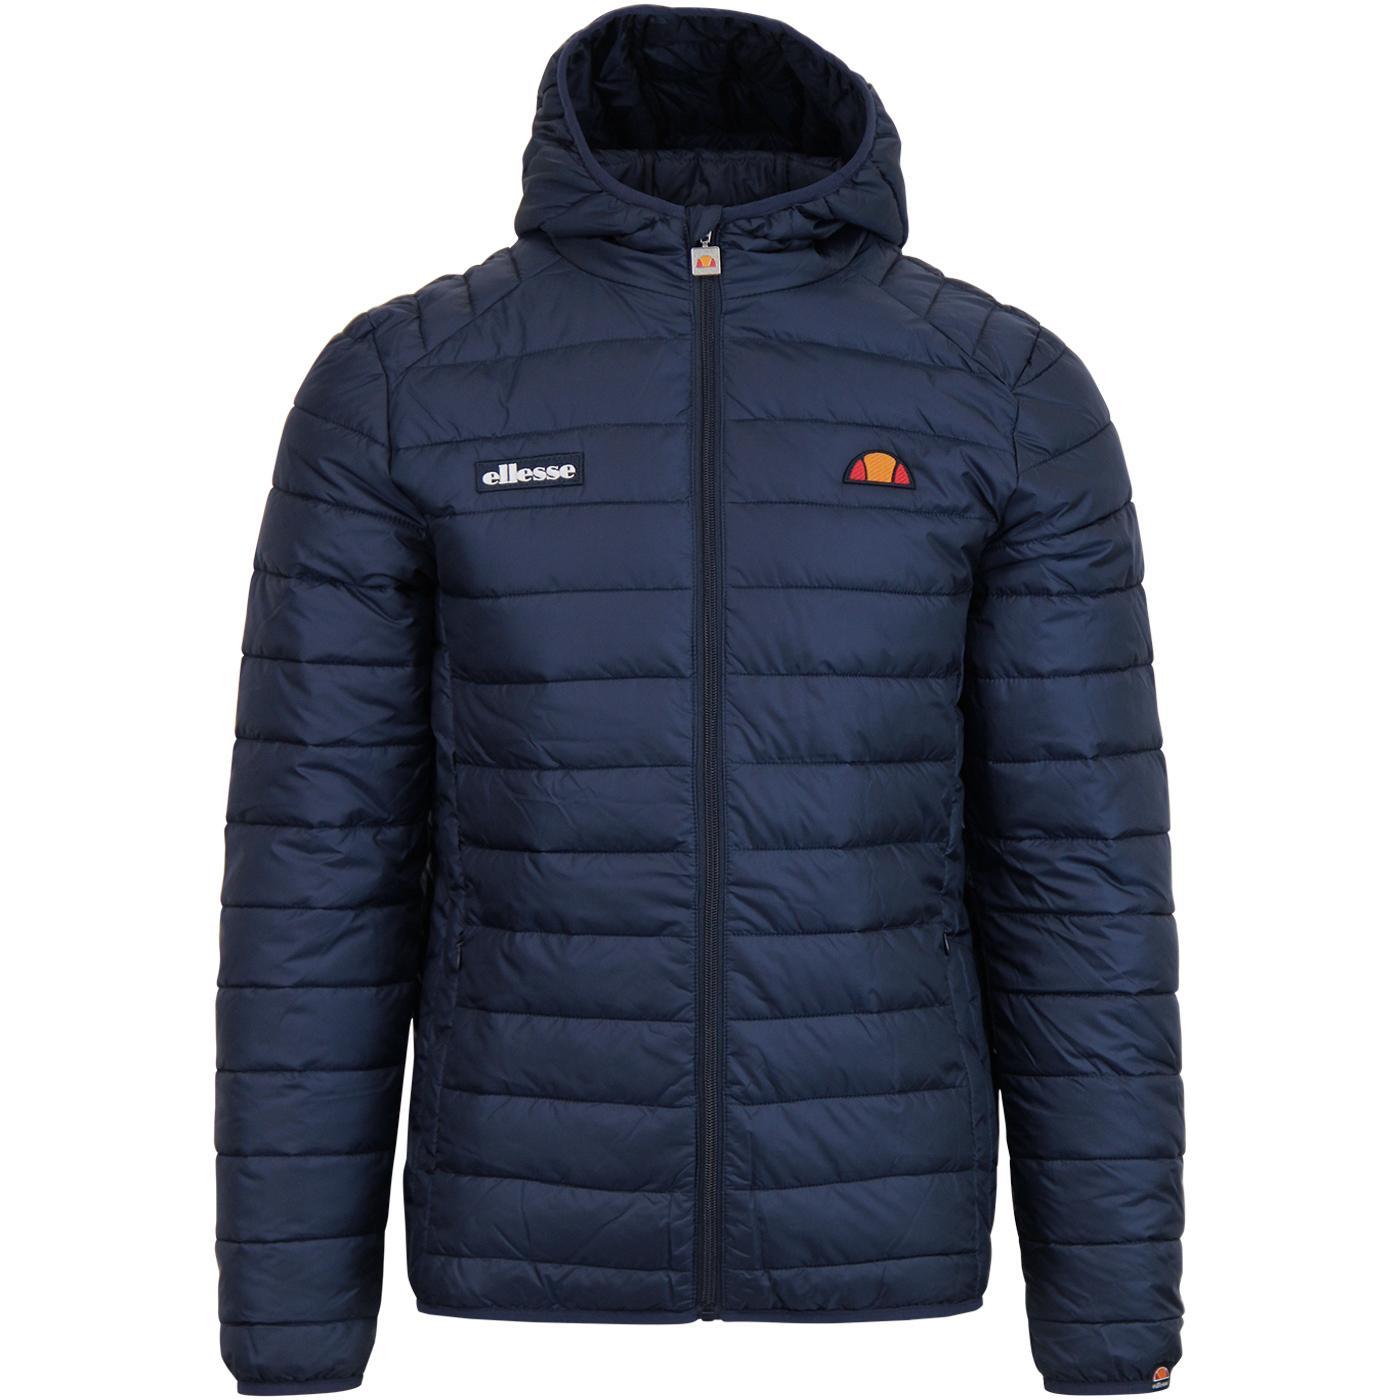 Lombardy ELLESSE Retro Mens Quilted Ski Jacket N